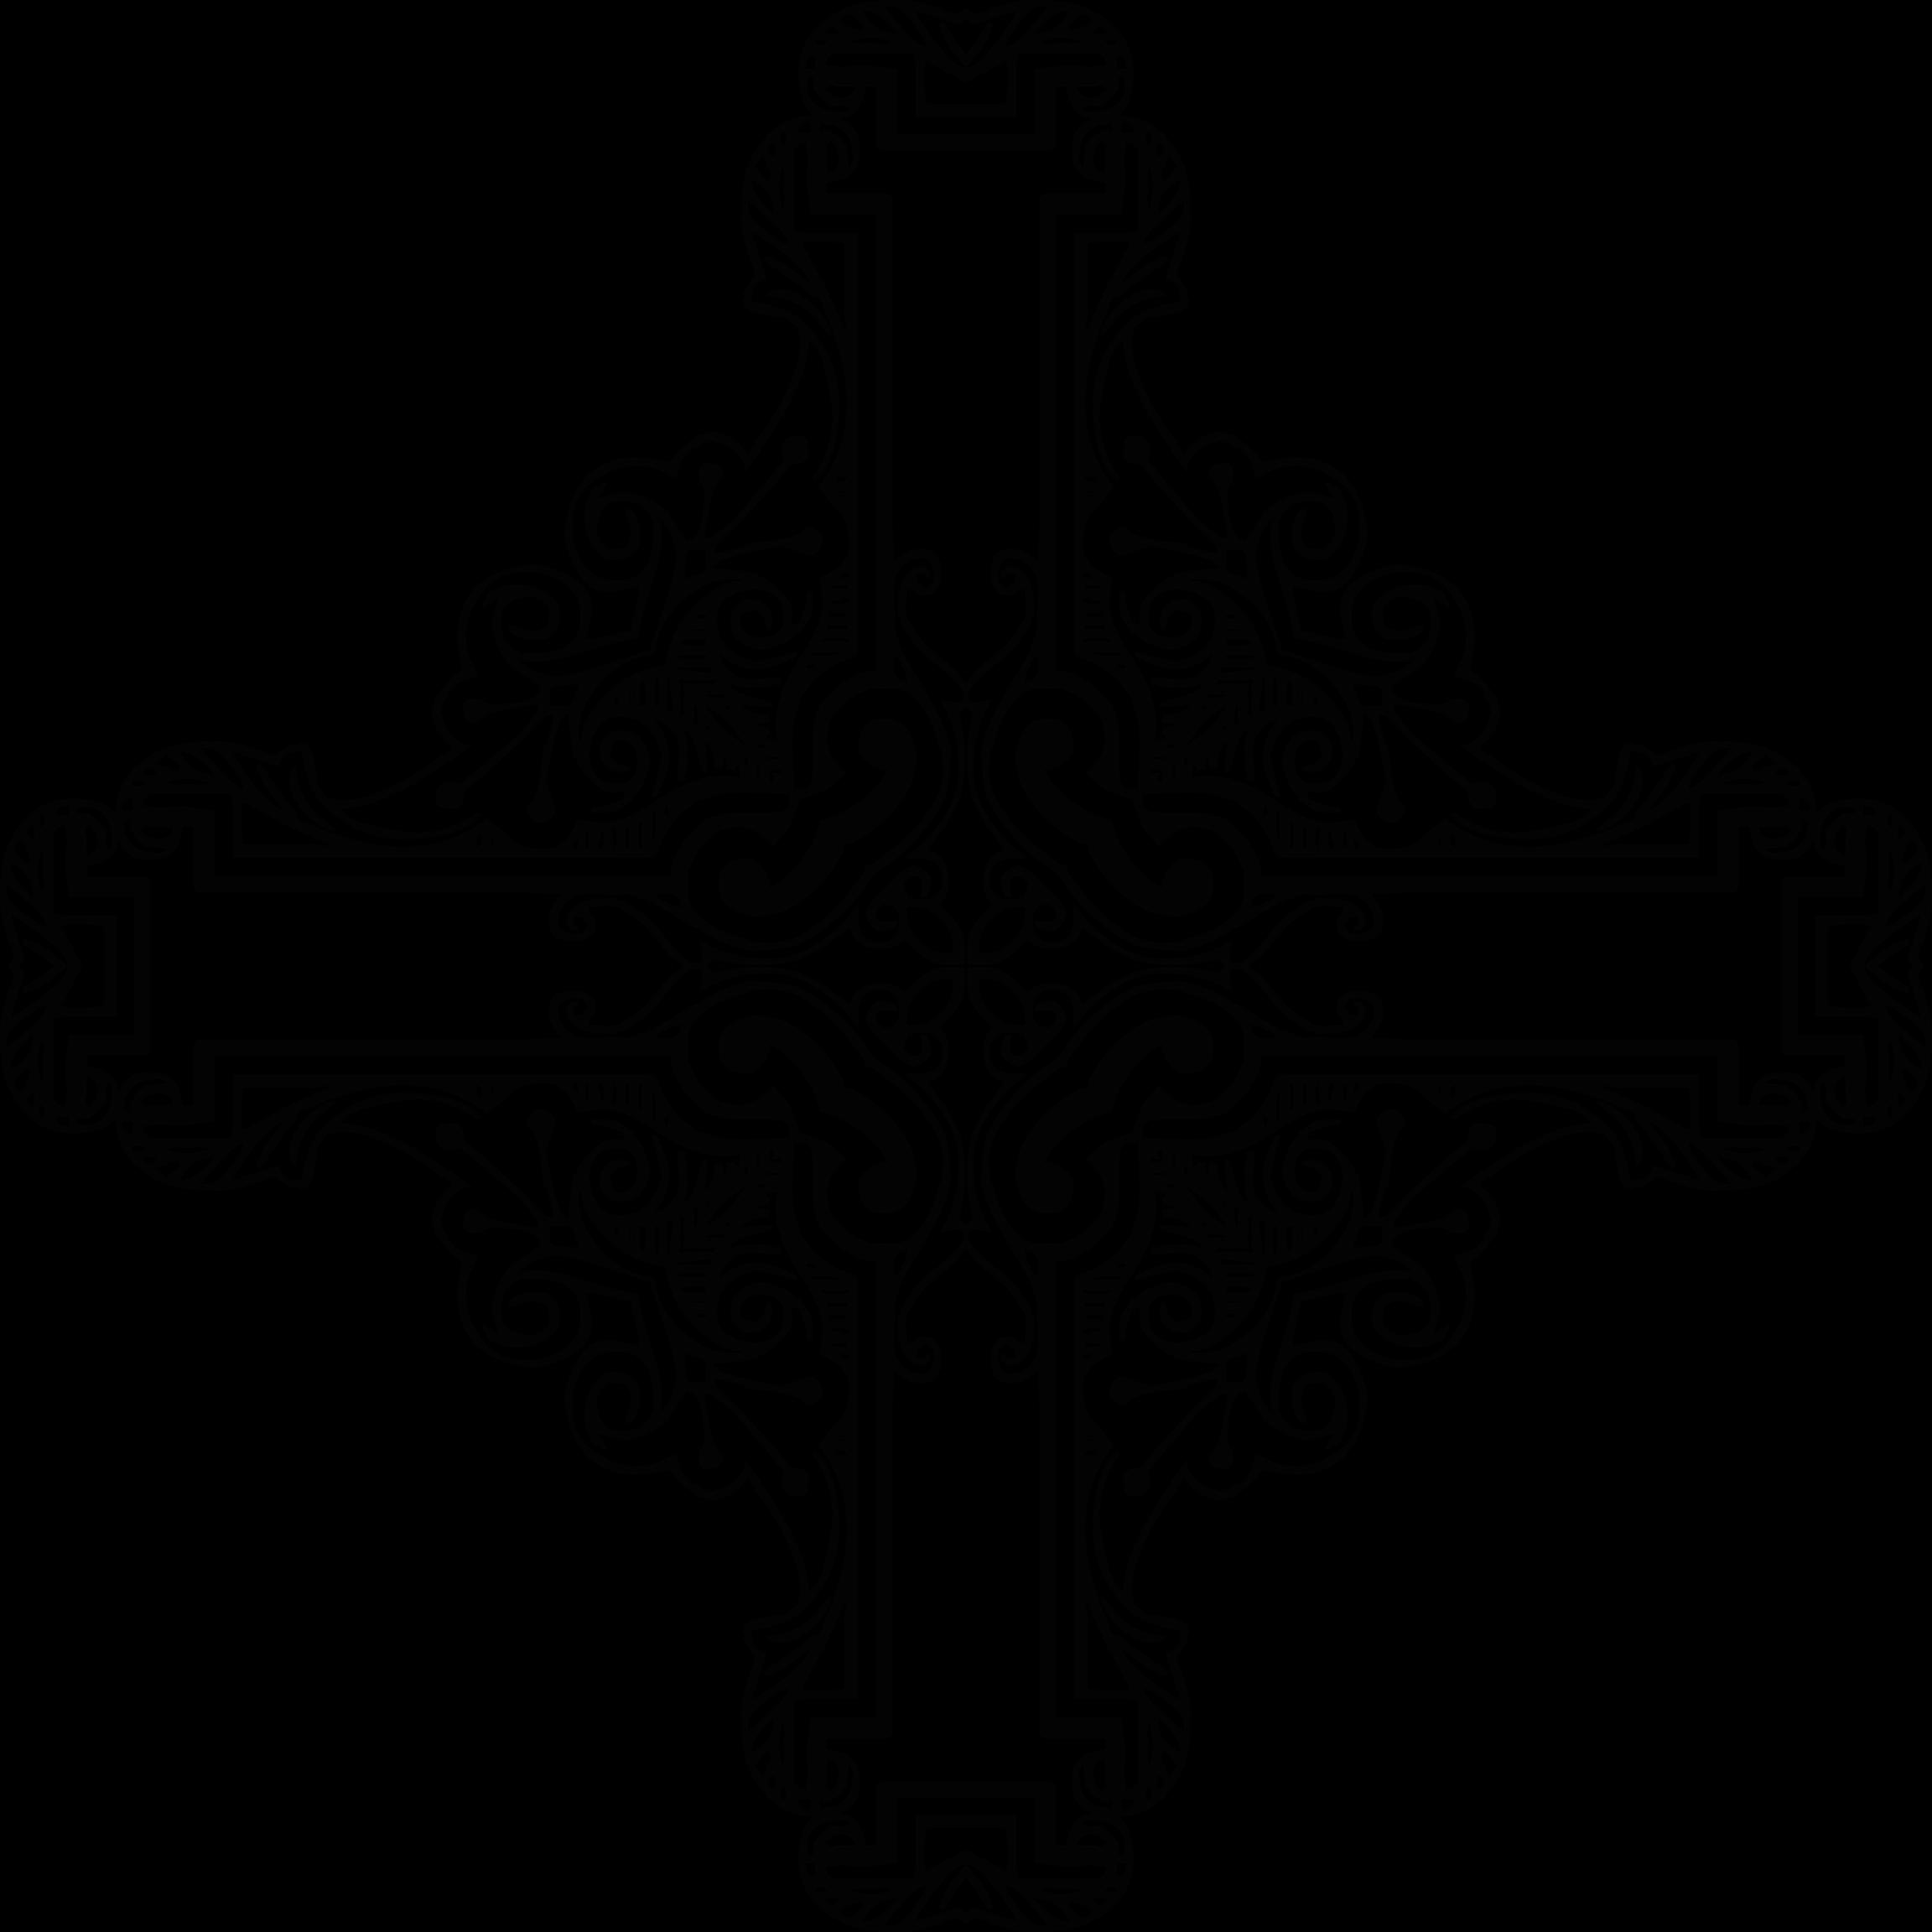 Clipart cross frame. Vintage symmetric big image